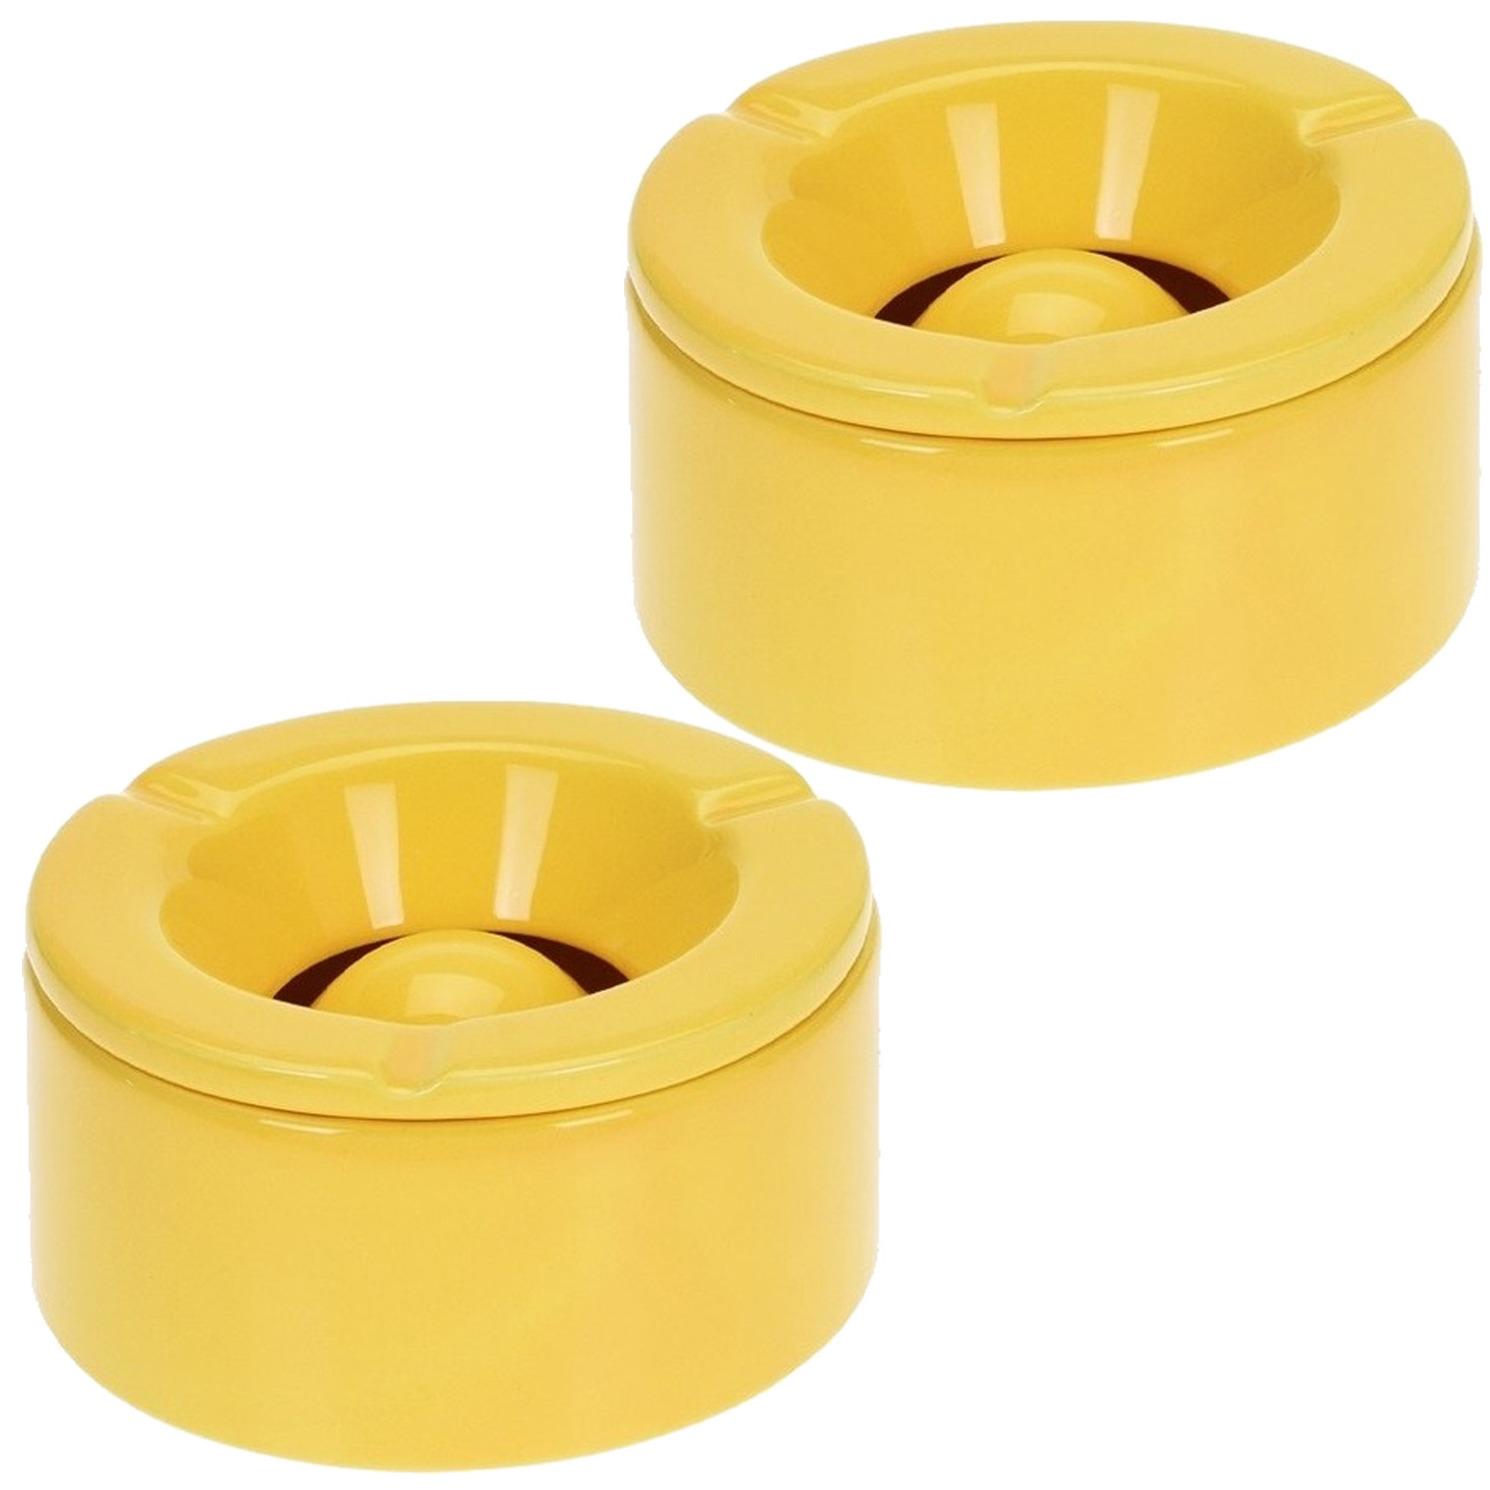 2x Gele storm/terras asbakken 14 cm